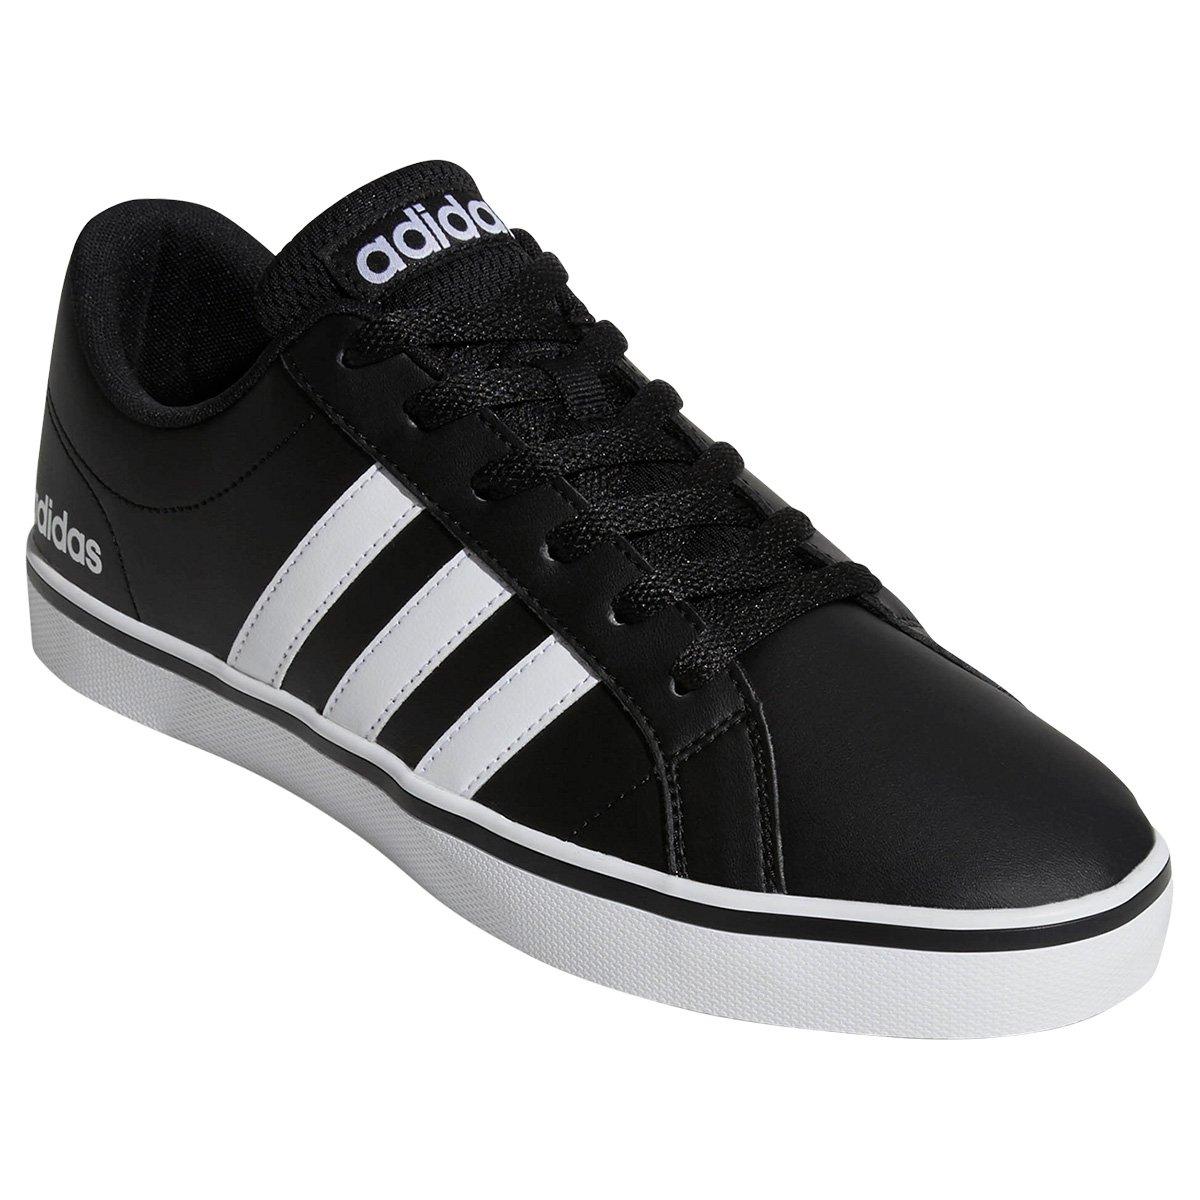 8bef53ecc Tênis Adidas Vs Pace Masculino - Preto - Compre Agora